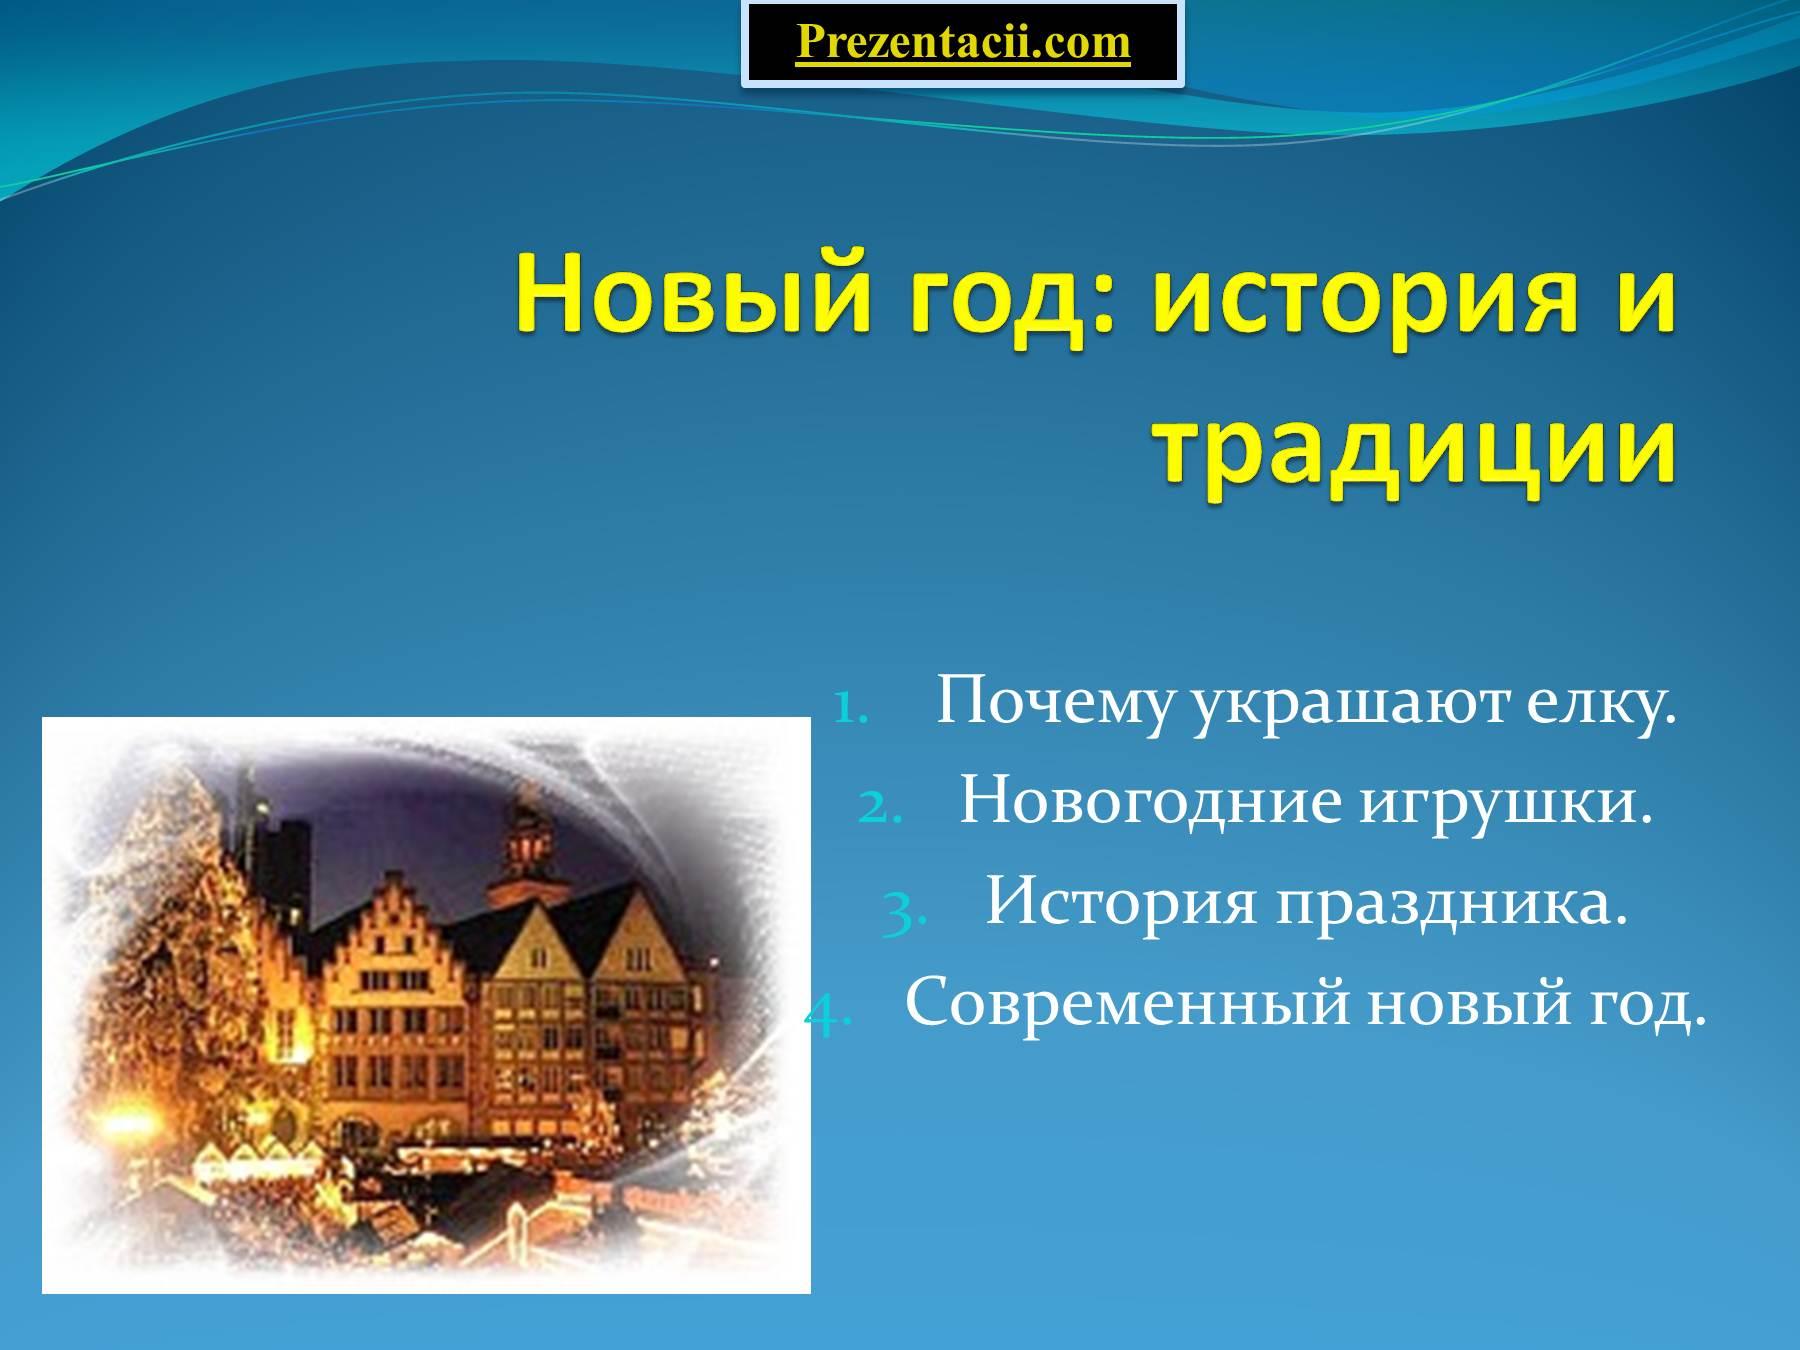 Презентация про новый год на русском